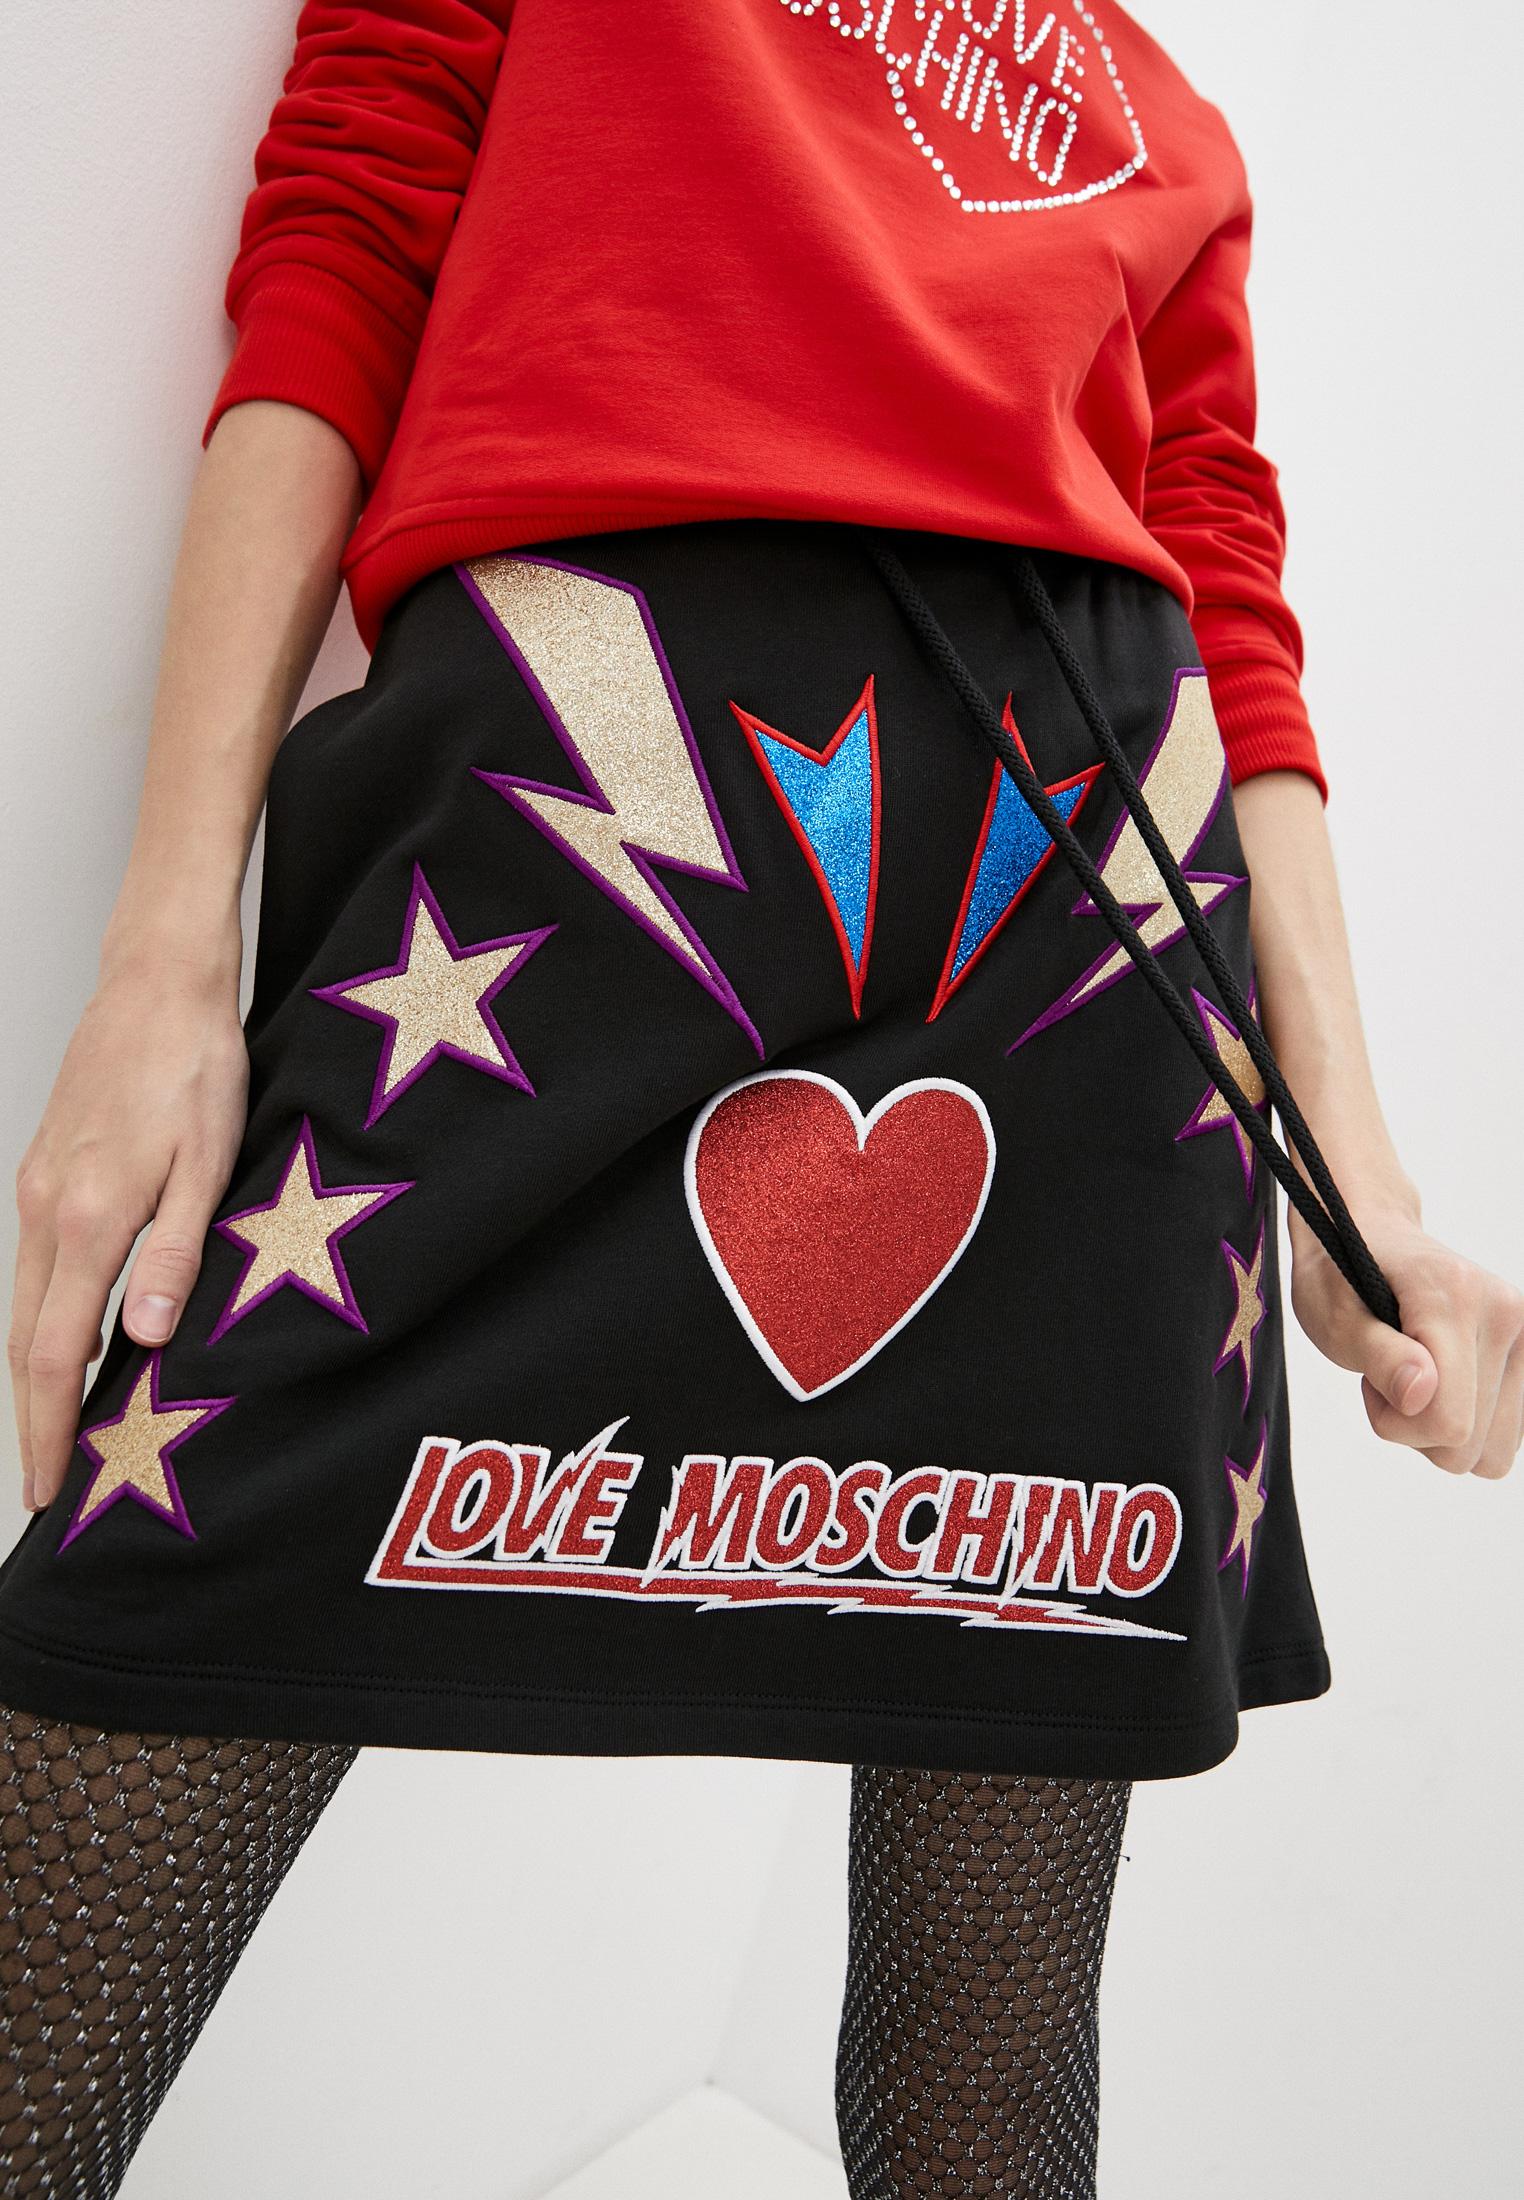 Широкая юбка Love Moschino Юбка Love Moschino